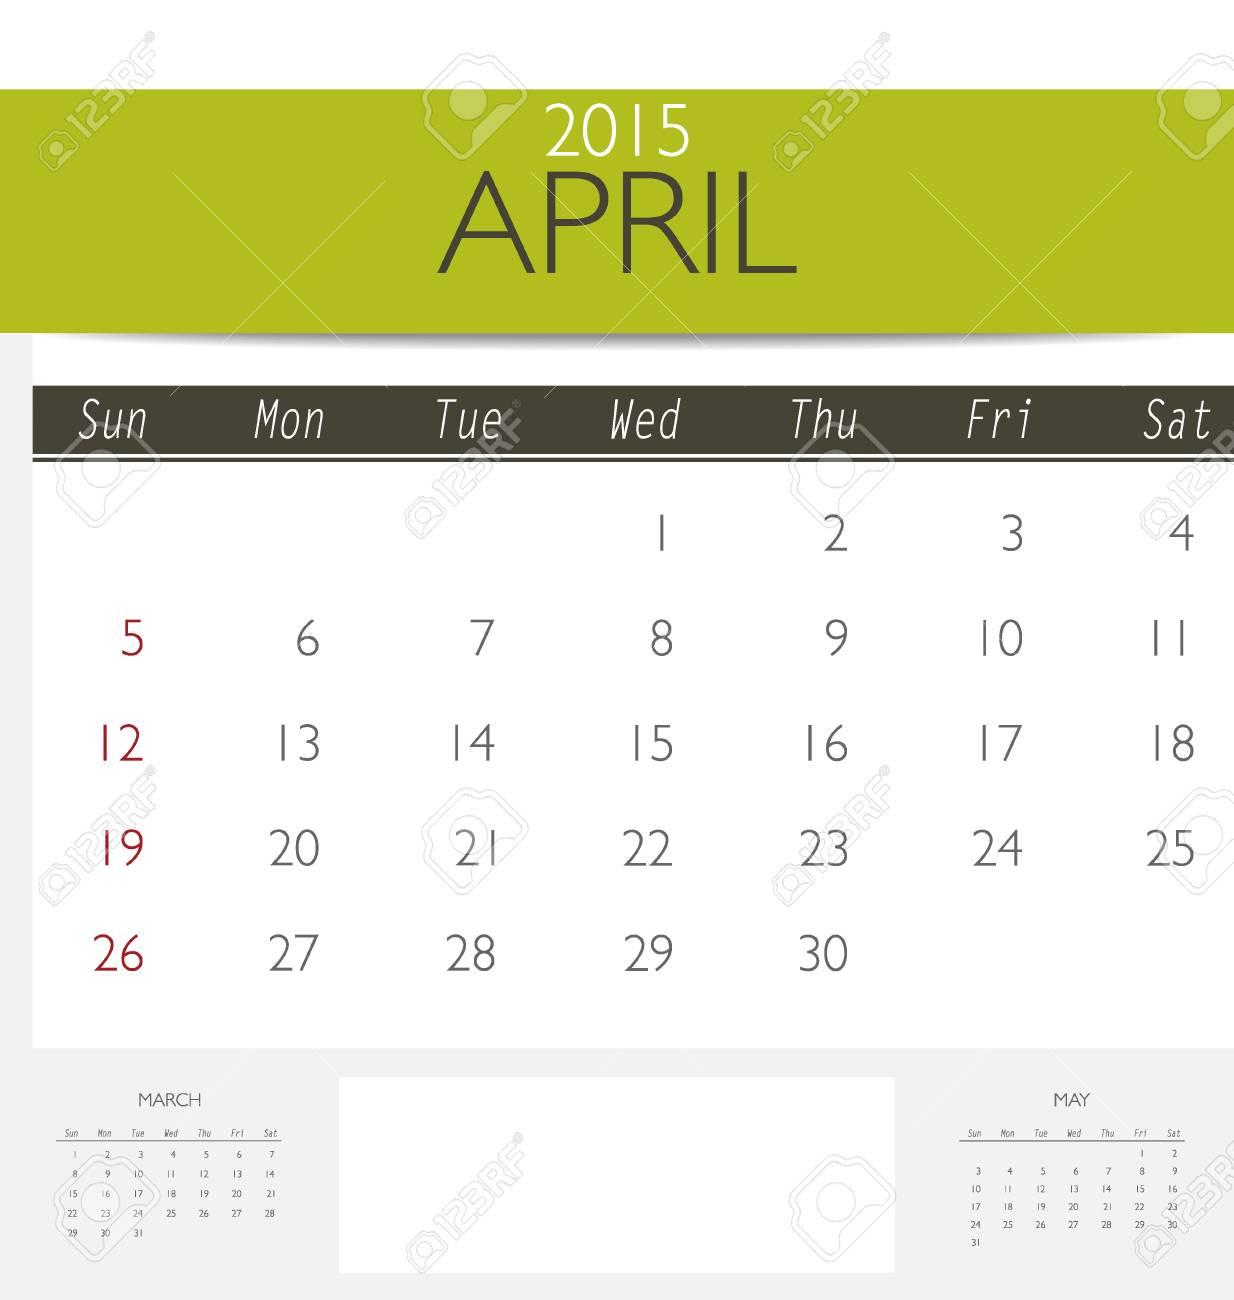 2015 Calendar Monthly Calendar Template For April Vector